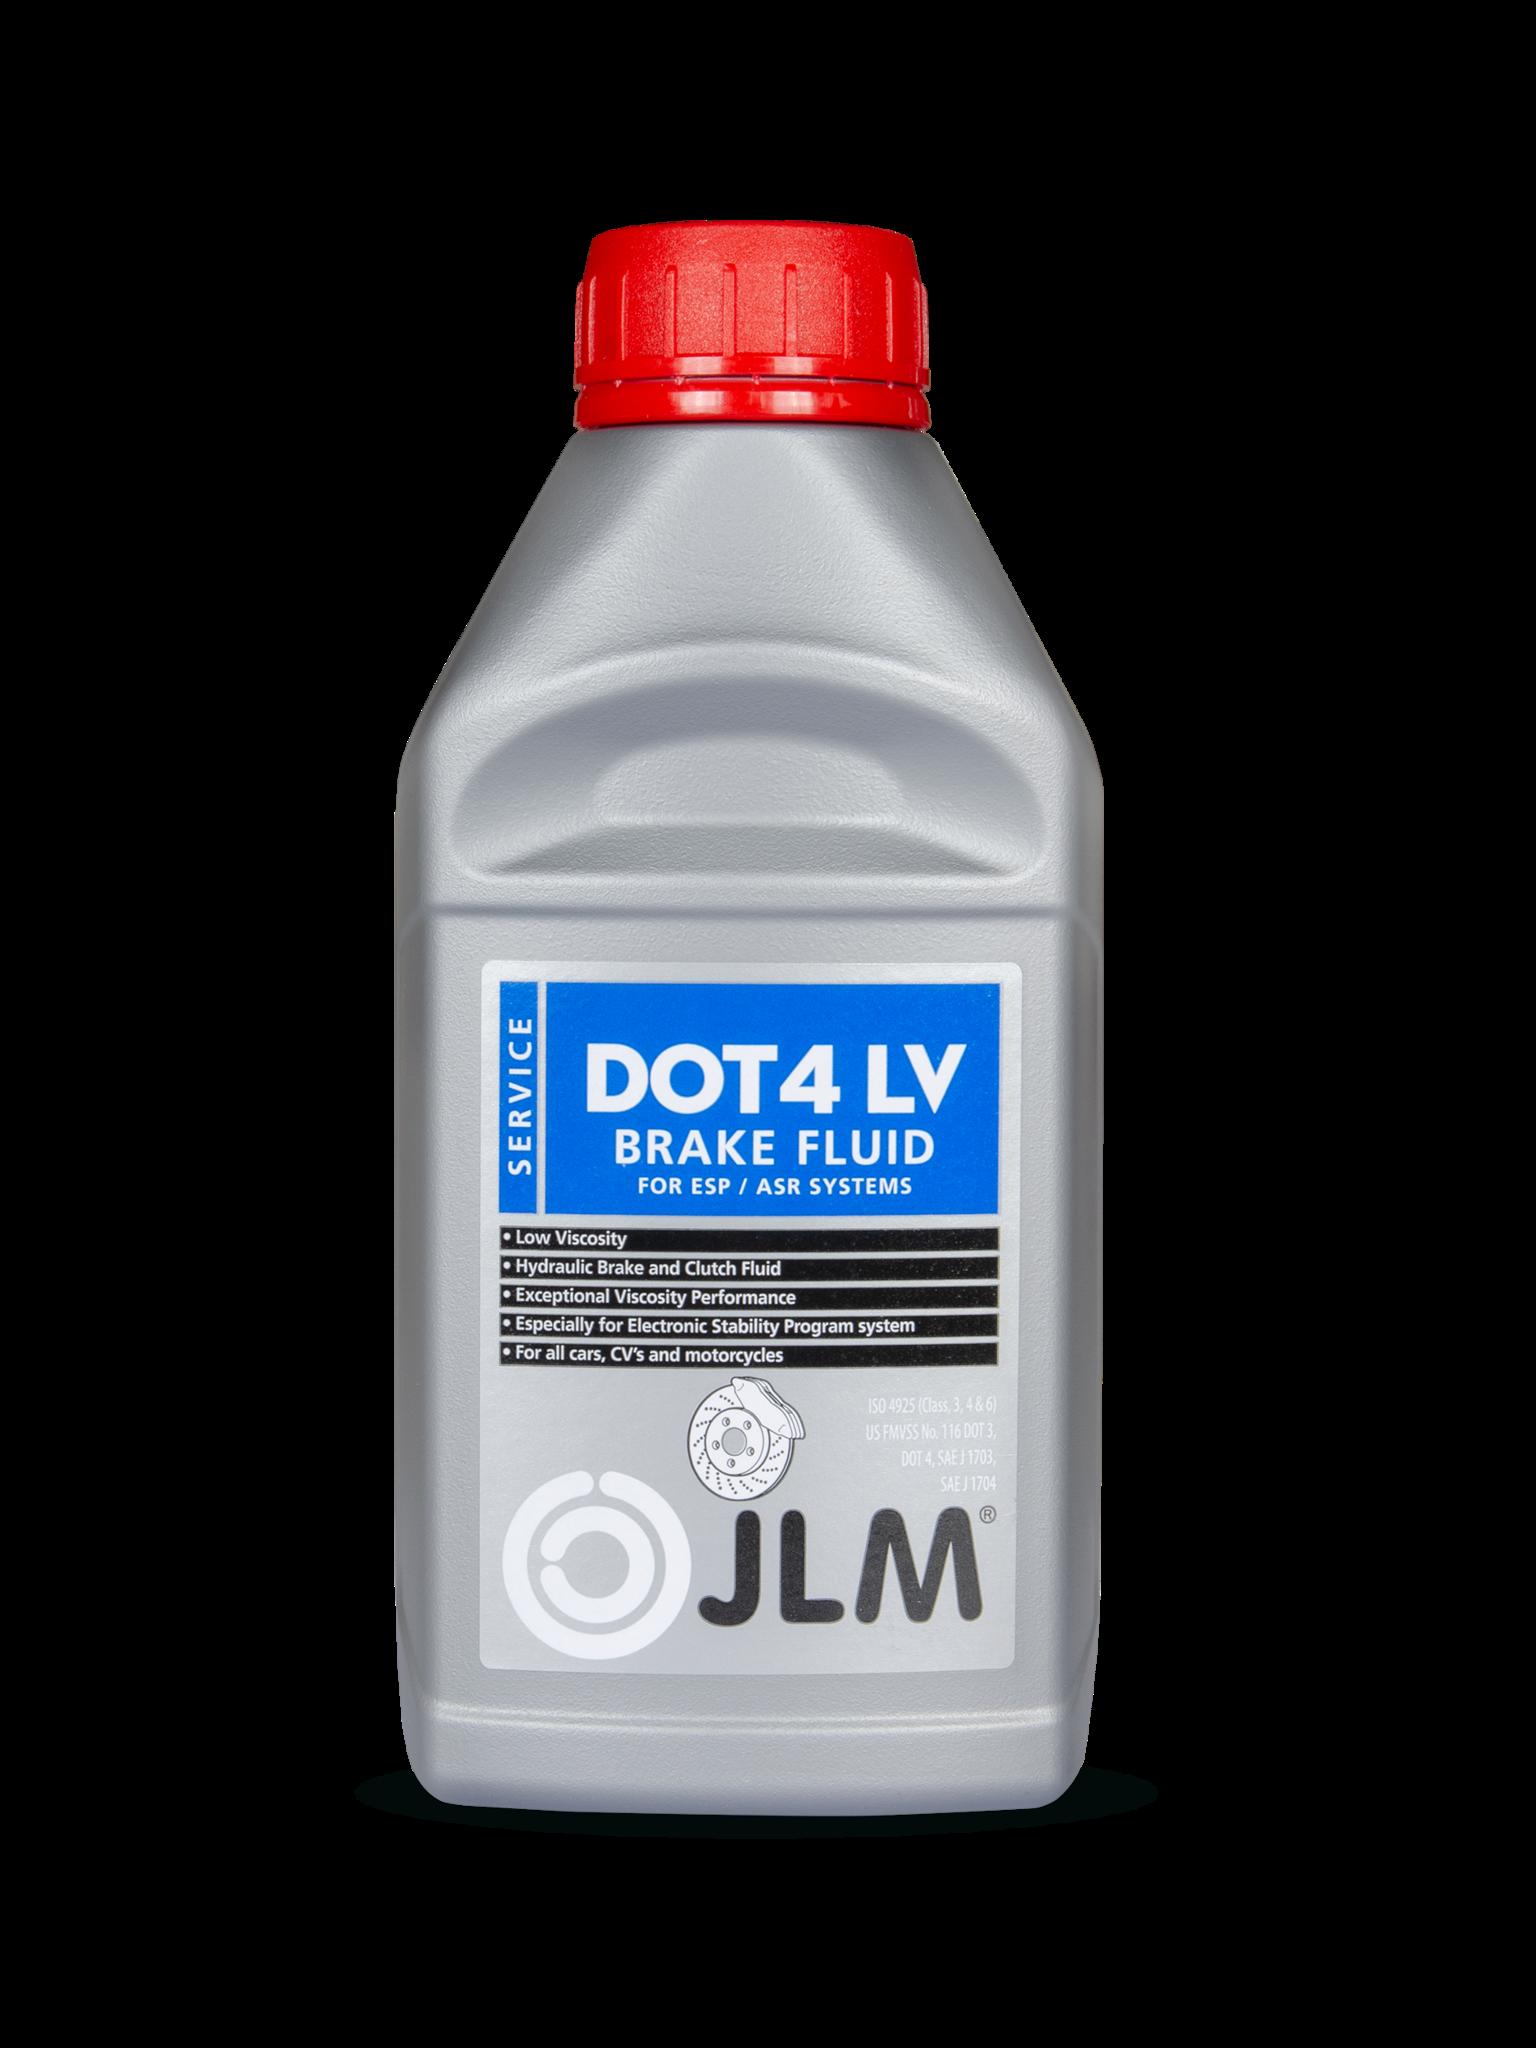 JLM Lubricants Brakefluid Dot 4 LV / ESP / ABS - 500ml